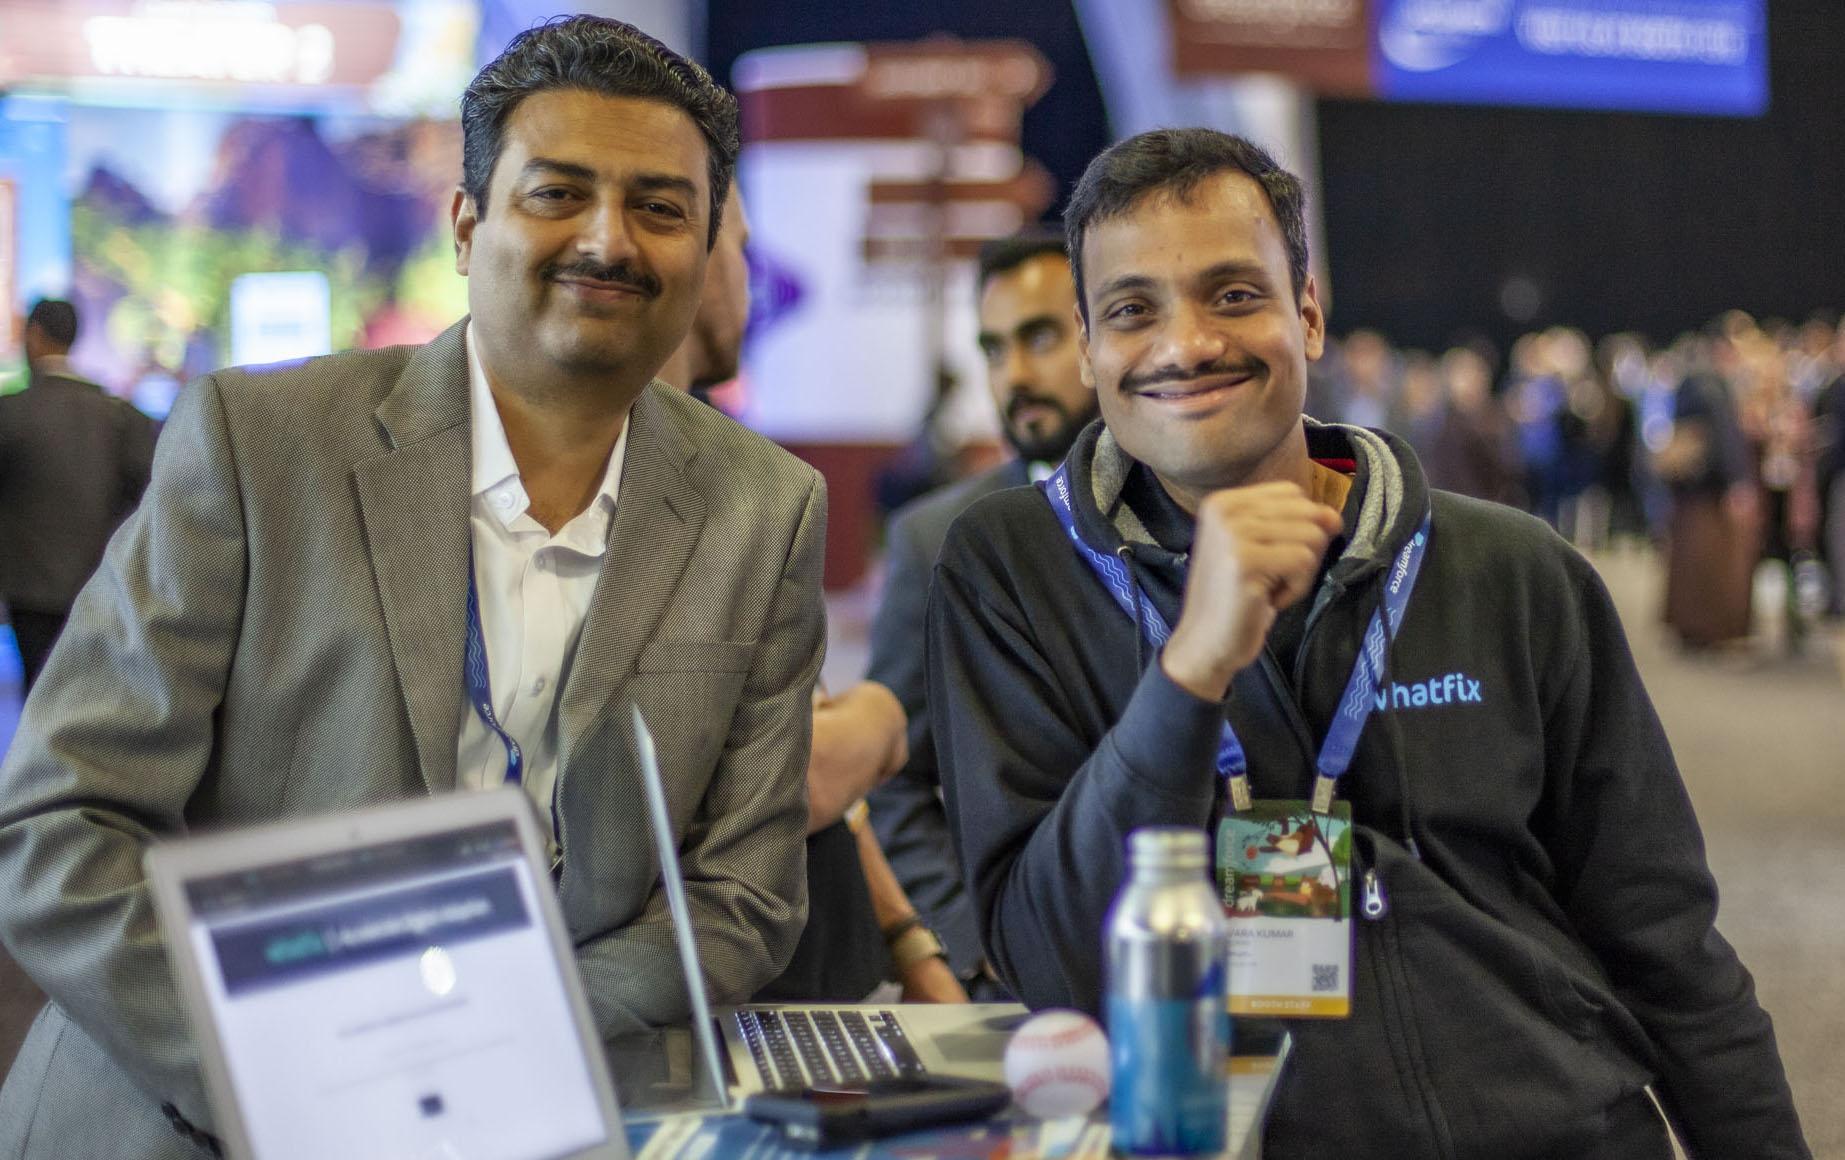 Khadim Batti, Vara Kumar, co-founders, Whatfix